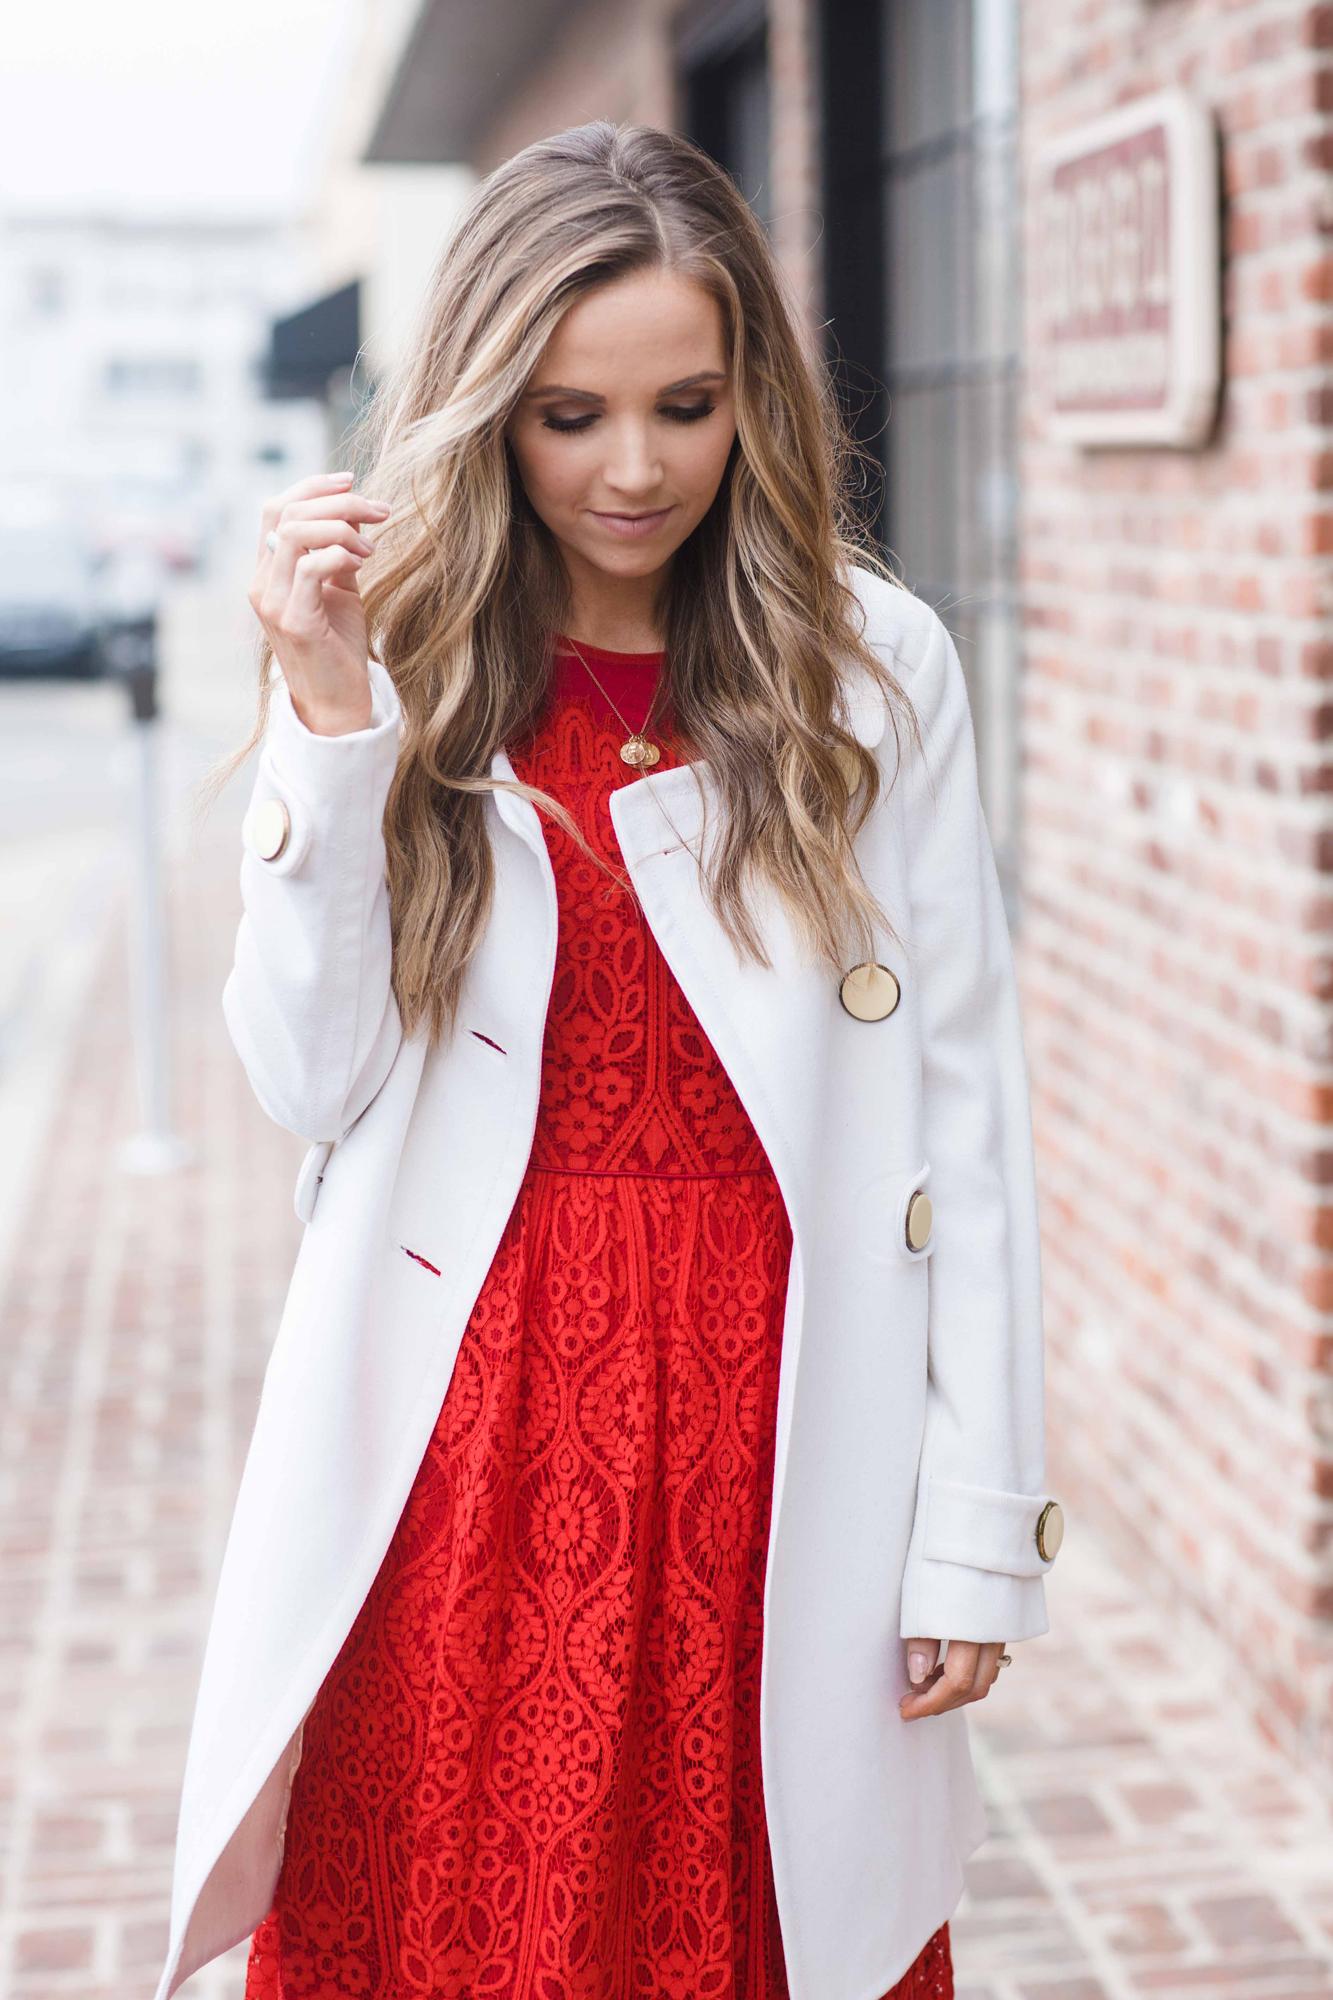 Merrick's Art Little Red Dress